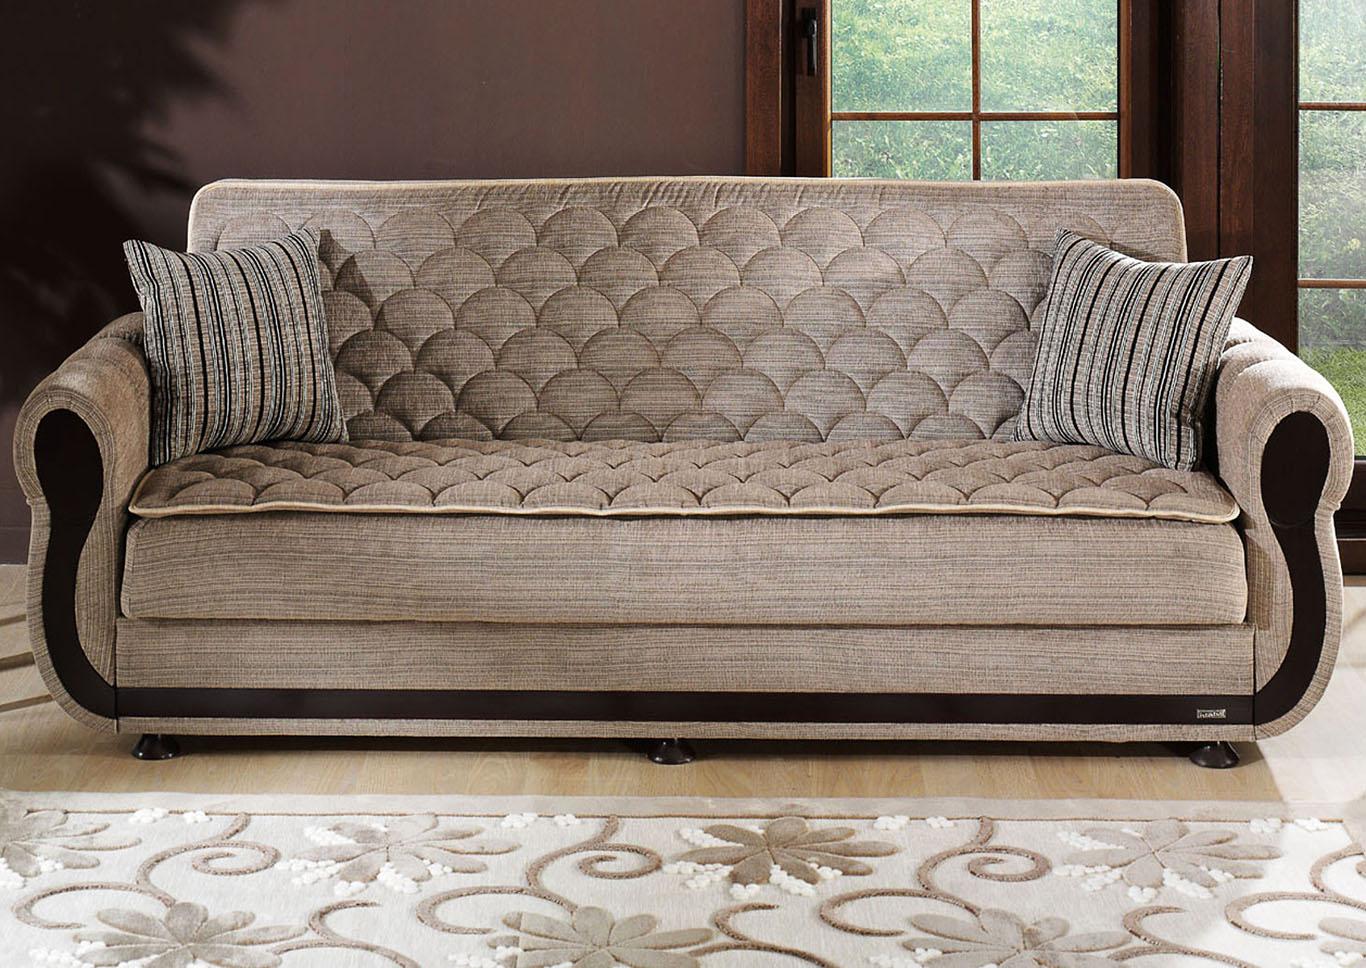 Brilliant 22 Furniture Gallery Argos Zilkade Brown 3 Piece Sofa Set Interior Design Ideas Skatsoteloinfo